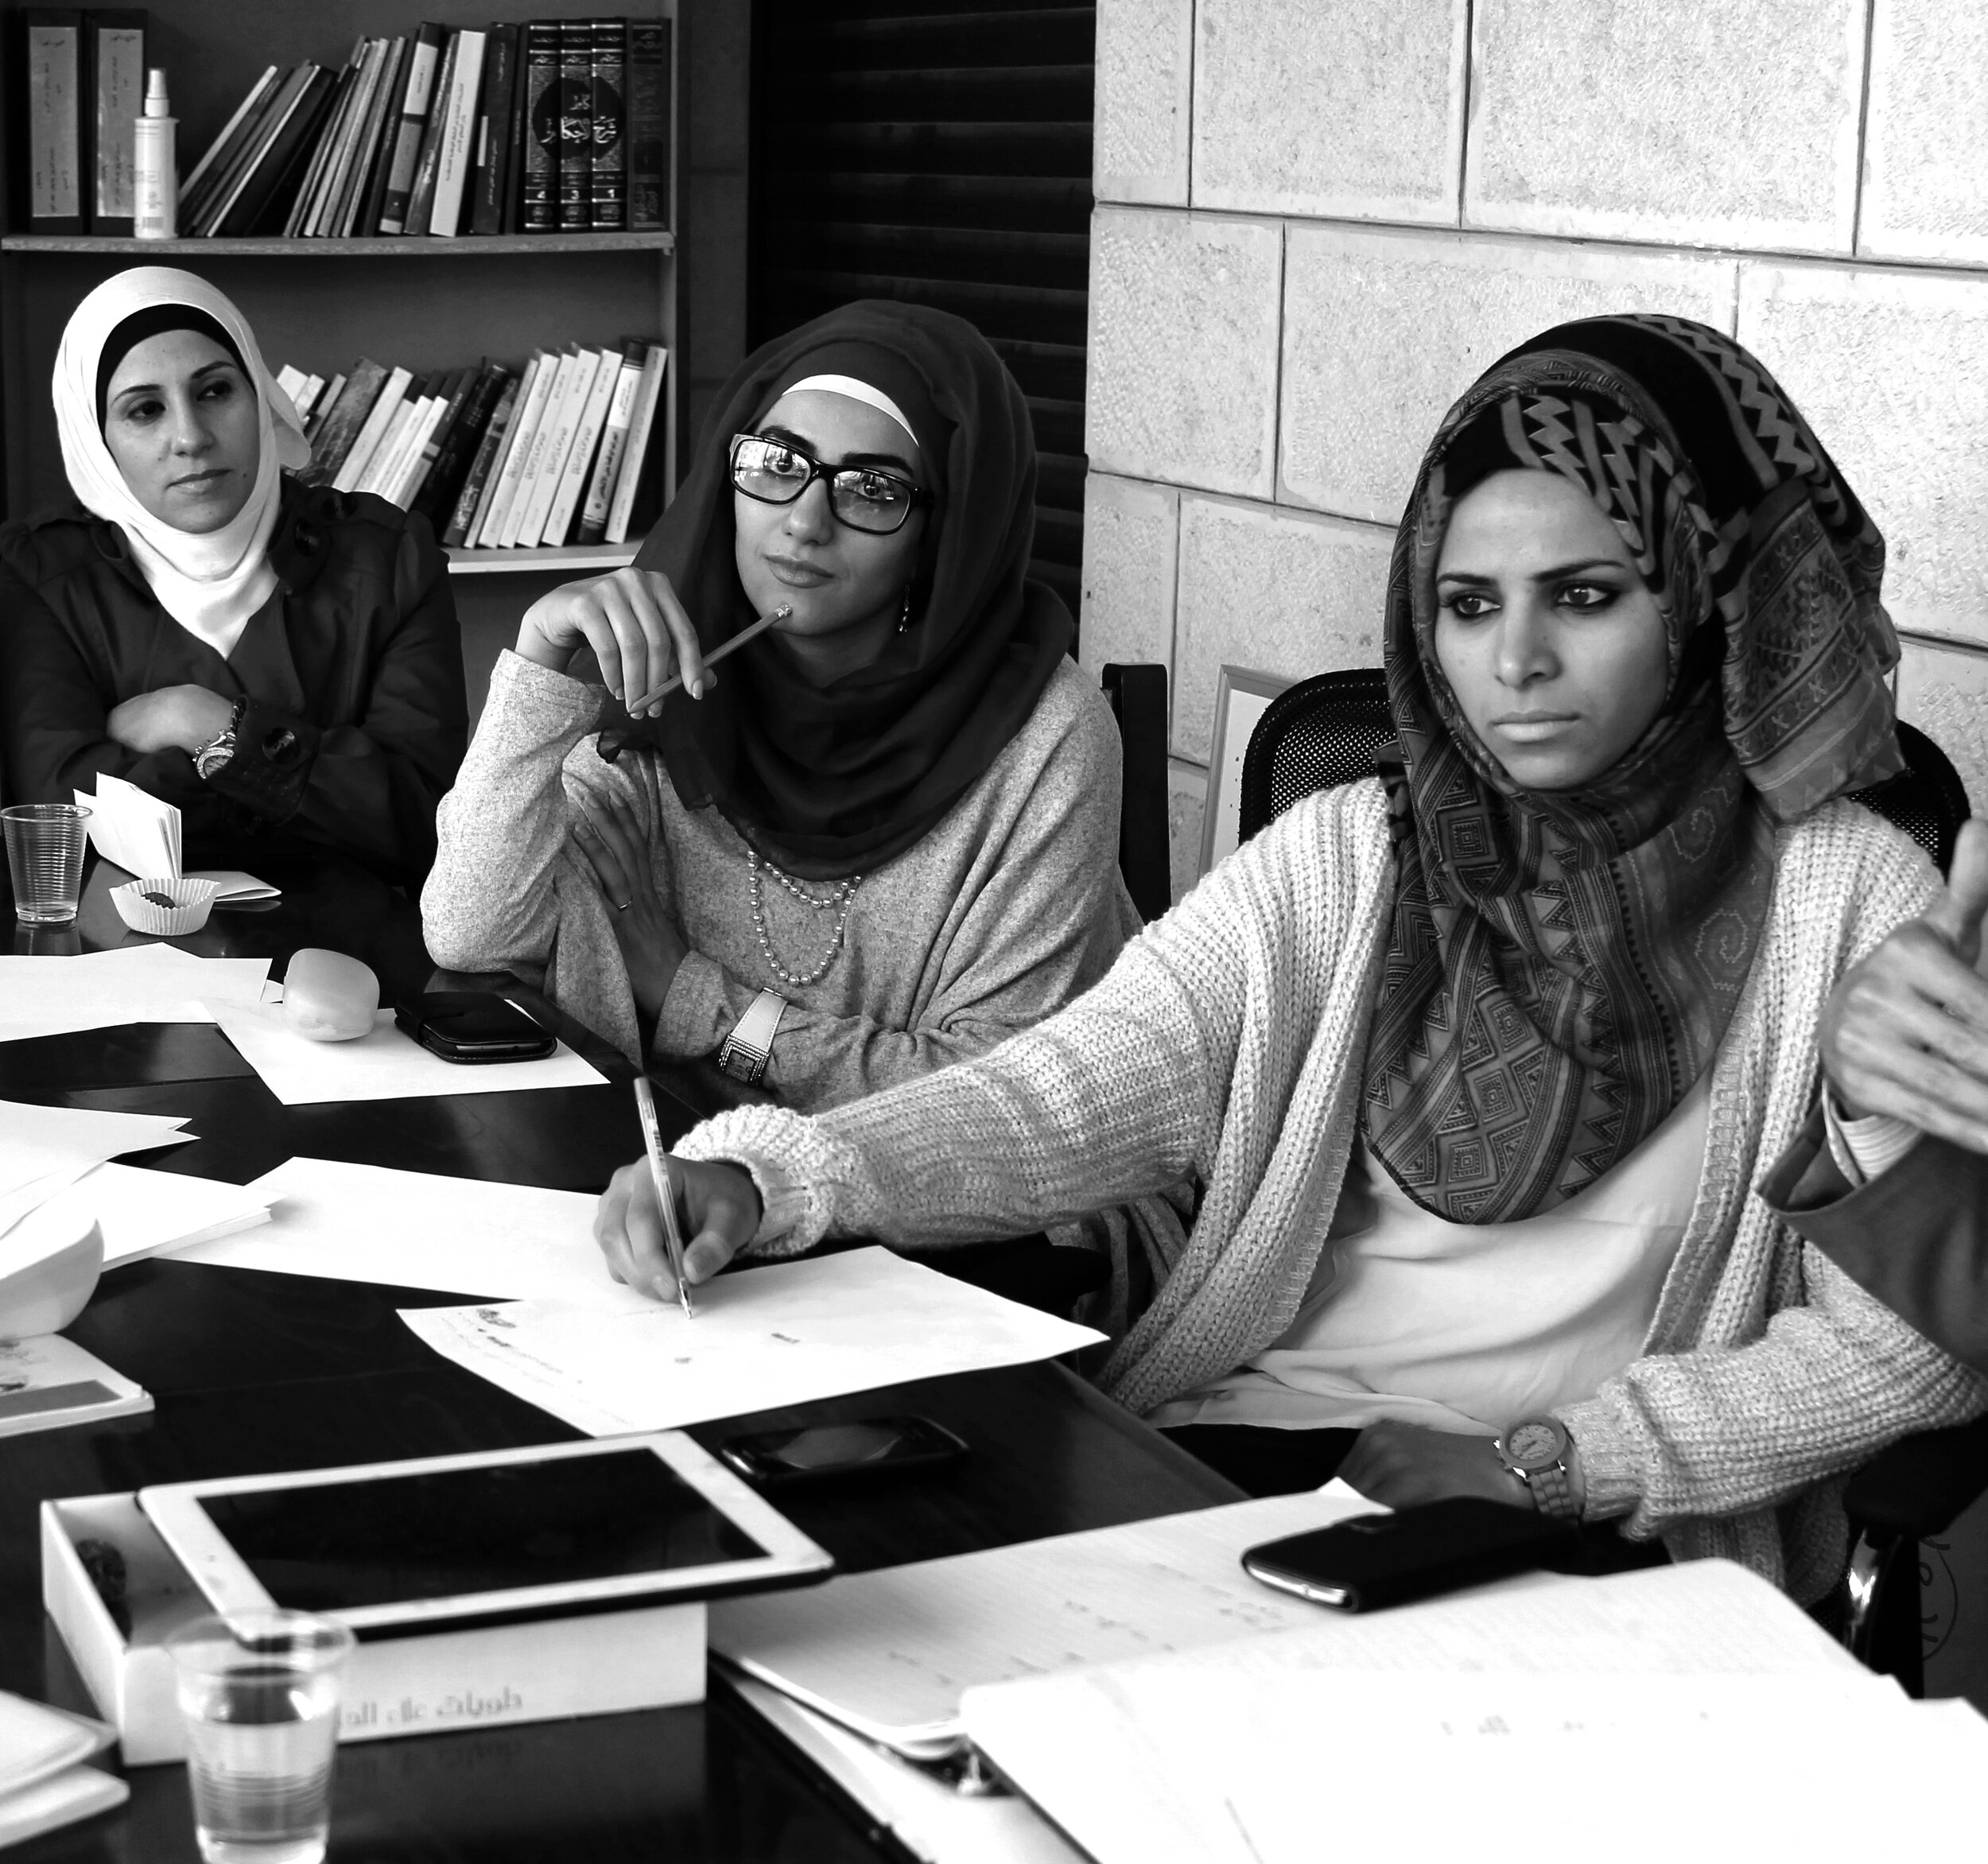 ILF_Palestine2.jpg